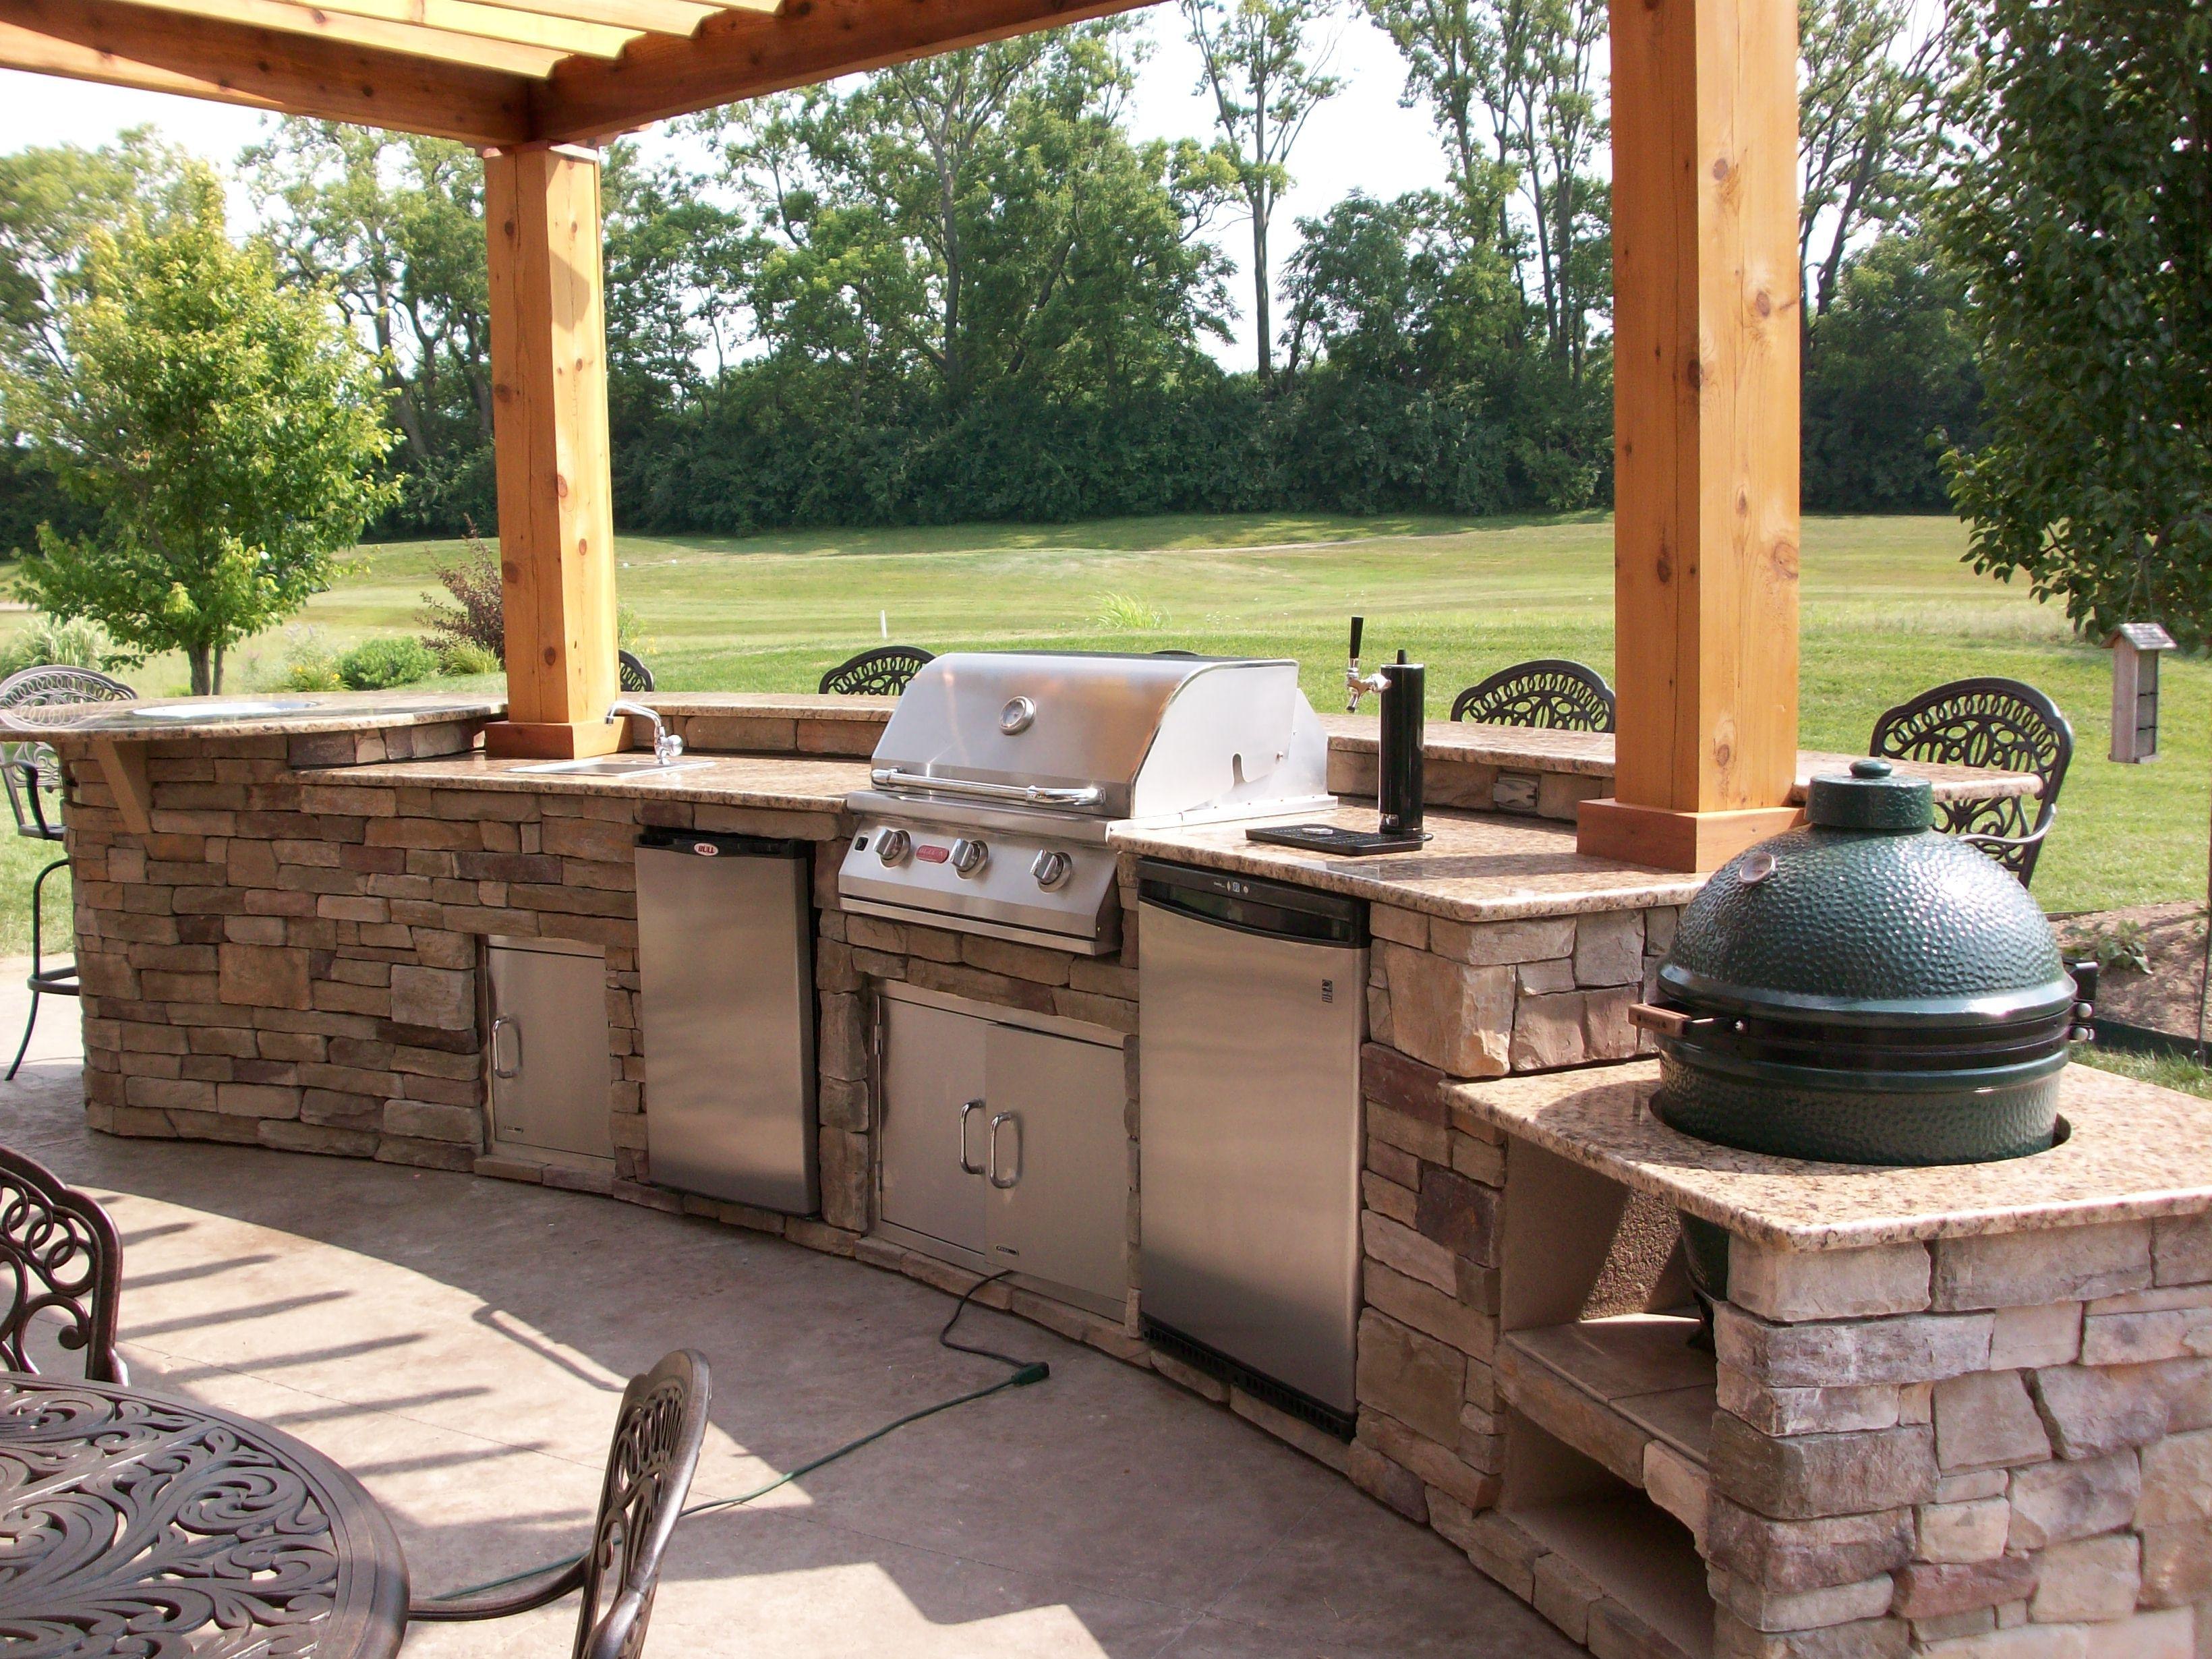 outdoor kitchen need at pavilion outdoor kitchen design outdoor kitchen design layout on outdoor kitchen plans layout id=85127